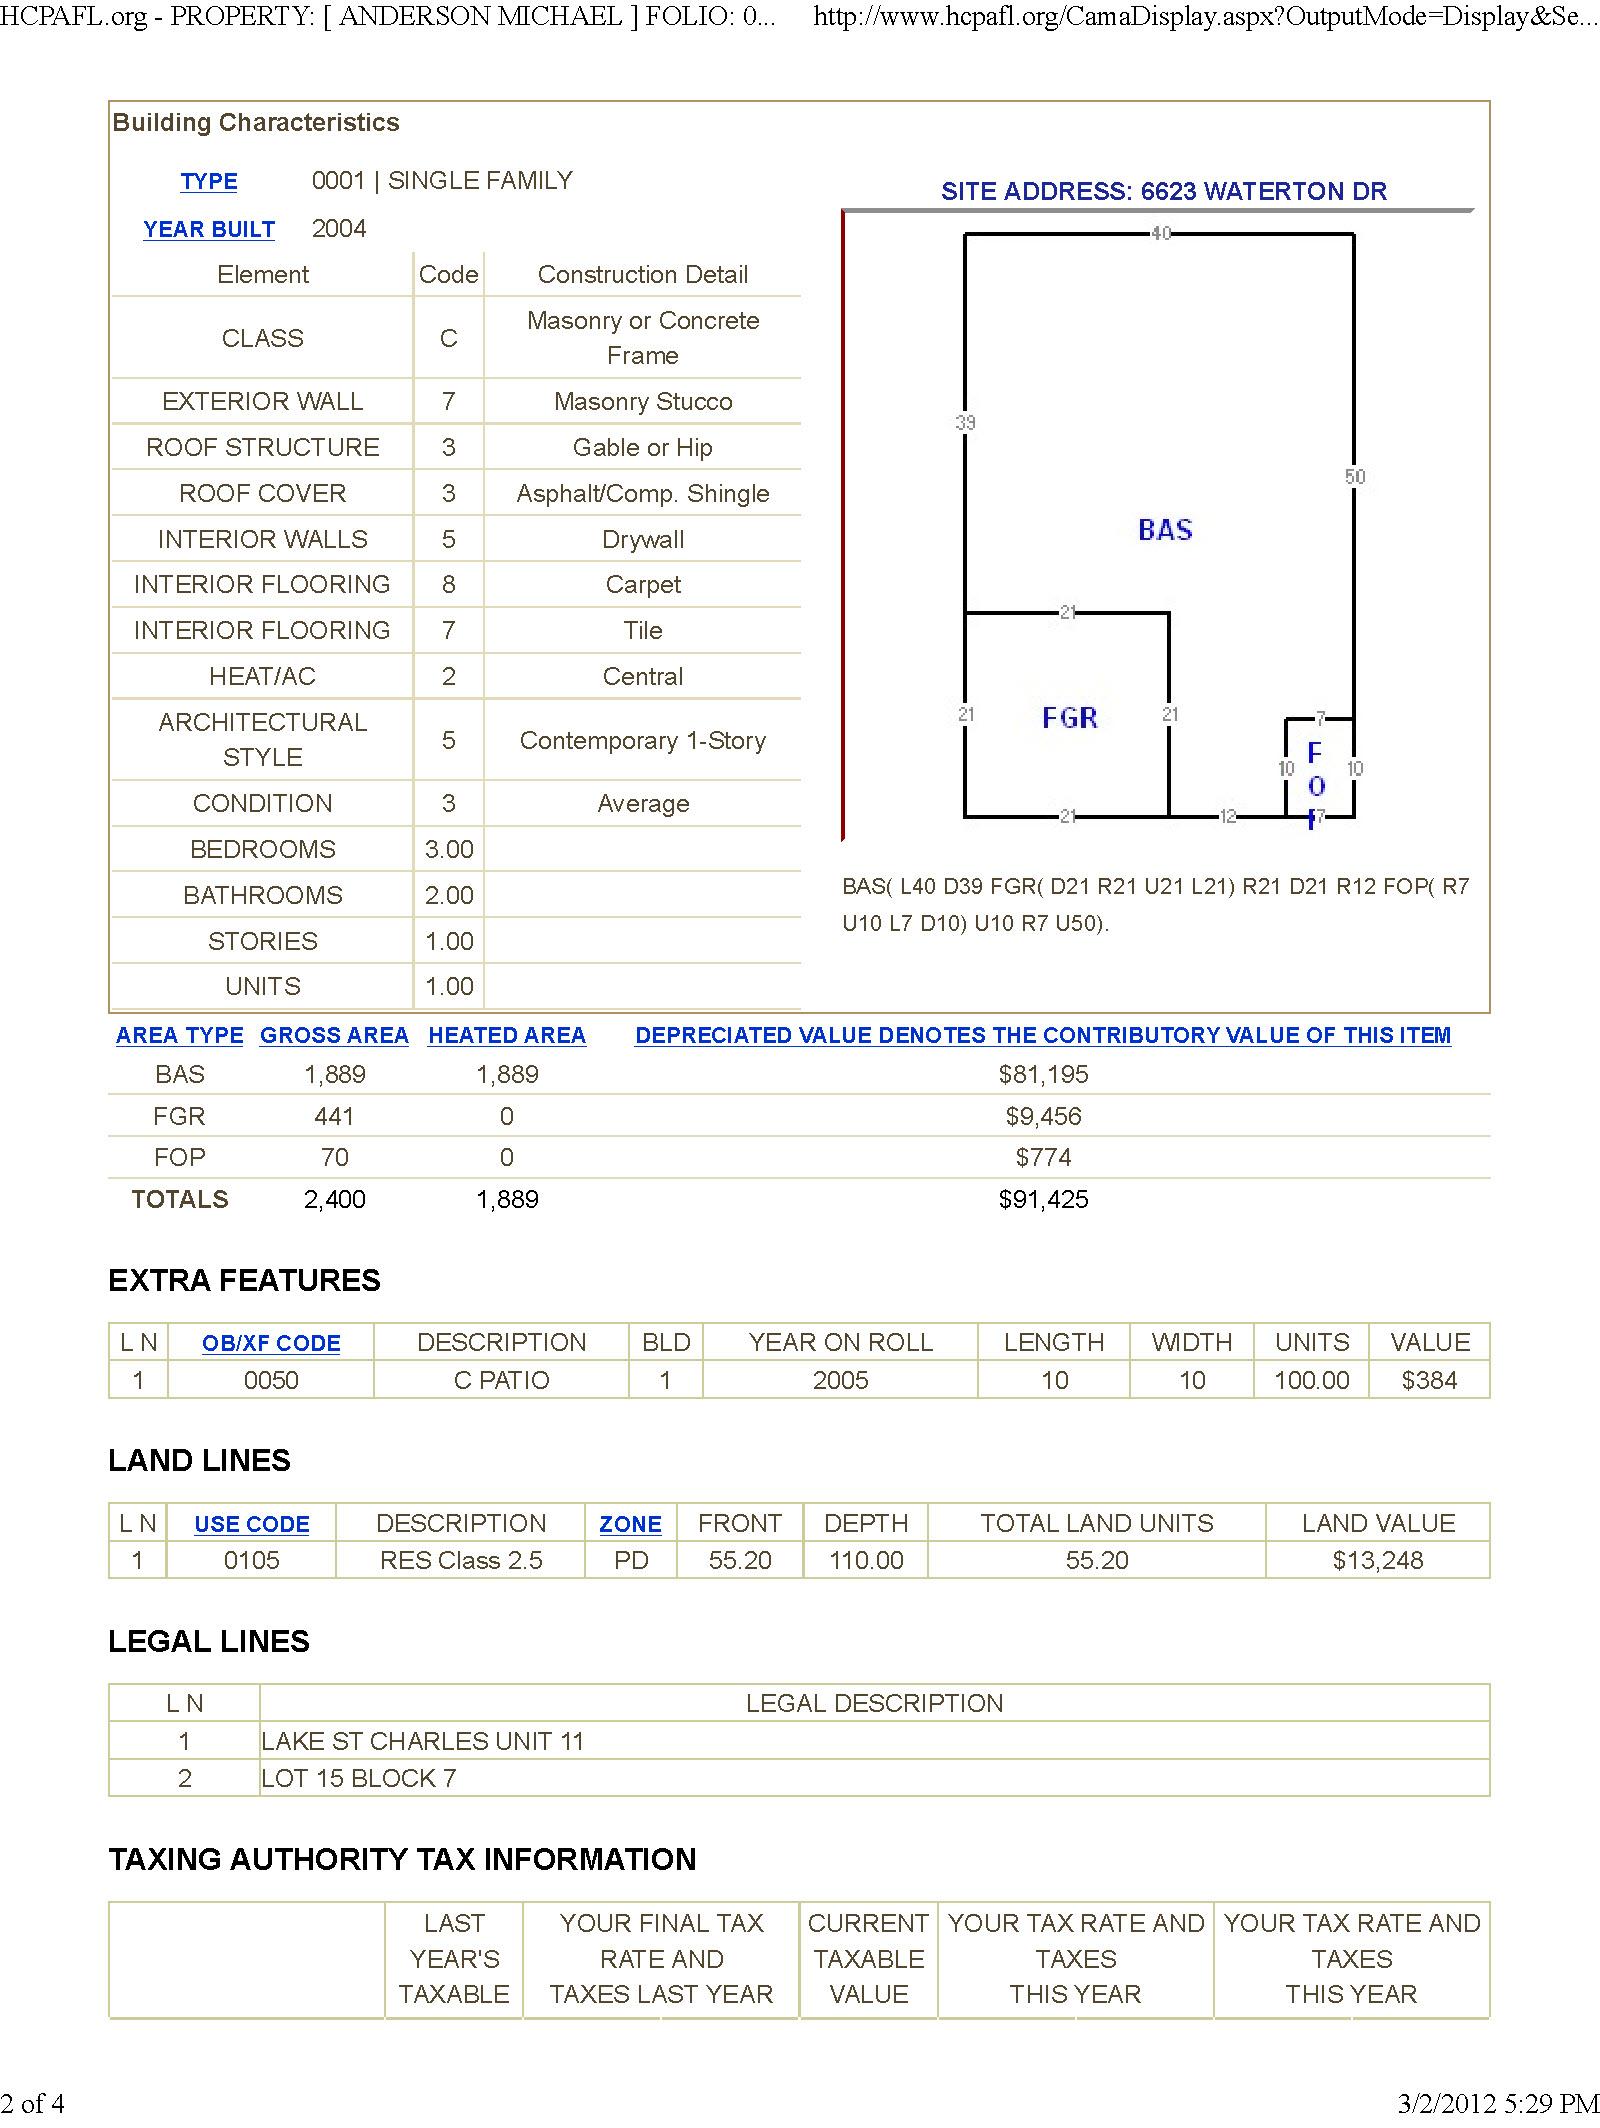 Copy of anderson ethel property tax info2.jpg